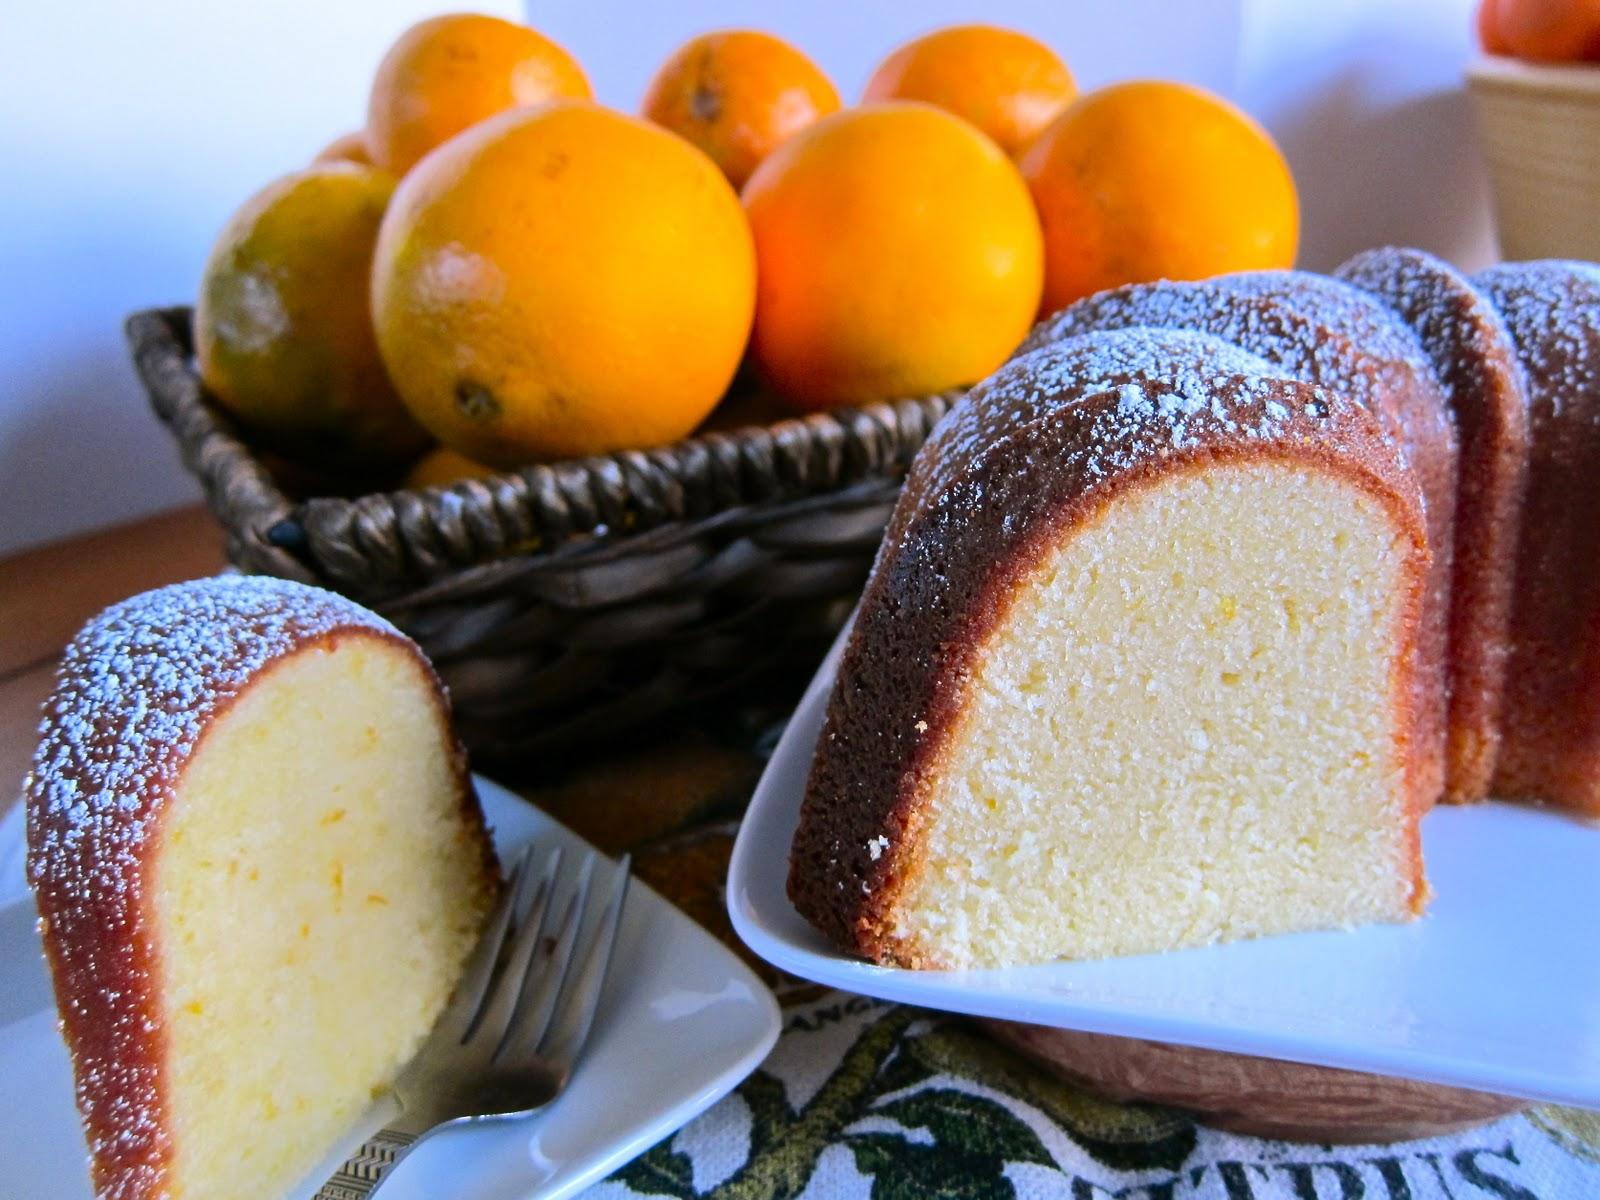 Arctic Garden Studio: Orange Olive Oil Cake